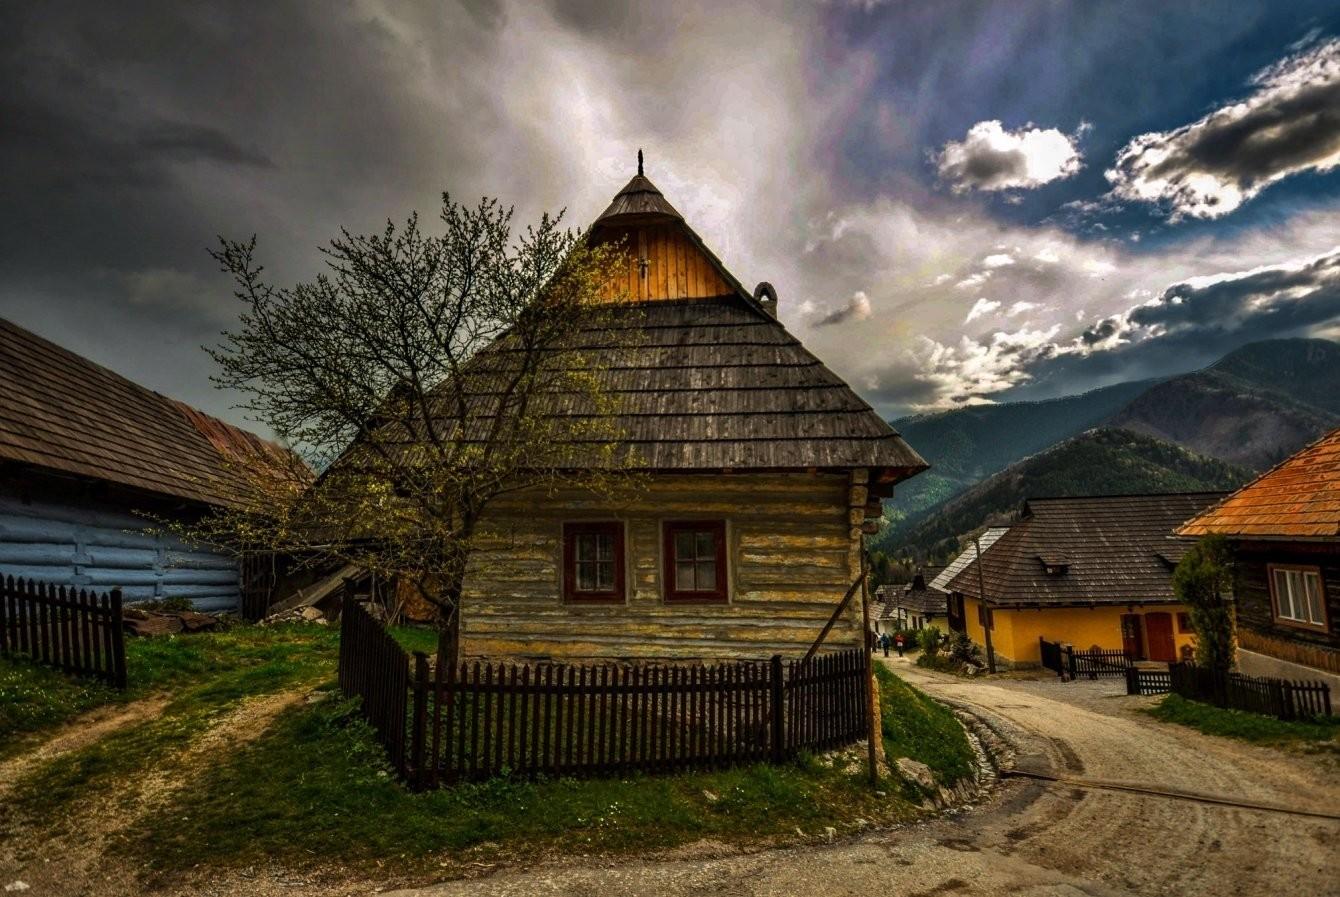 Abitazione rurale in Slovacchia